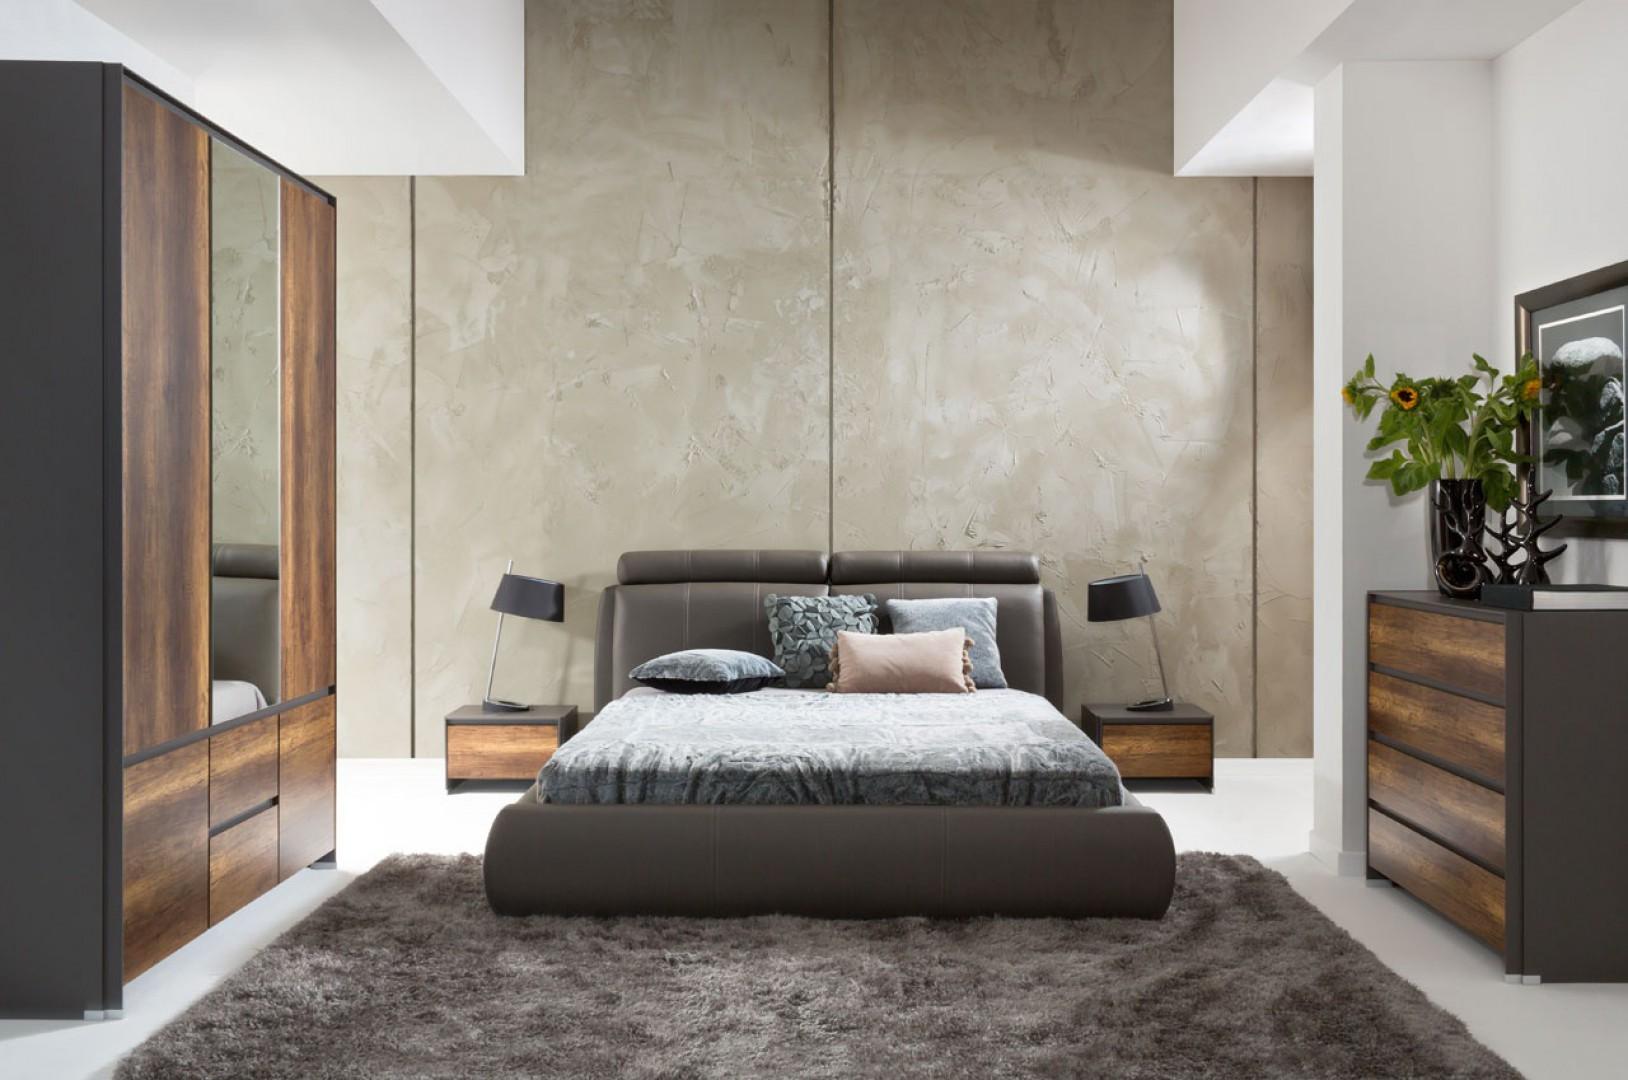 Katalog Mebli Fini Przytulne łóżko Do Sypialni Meble